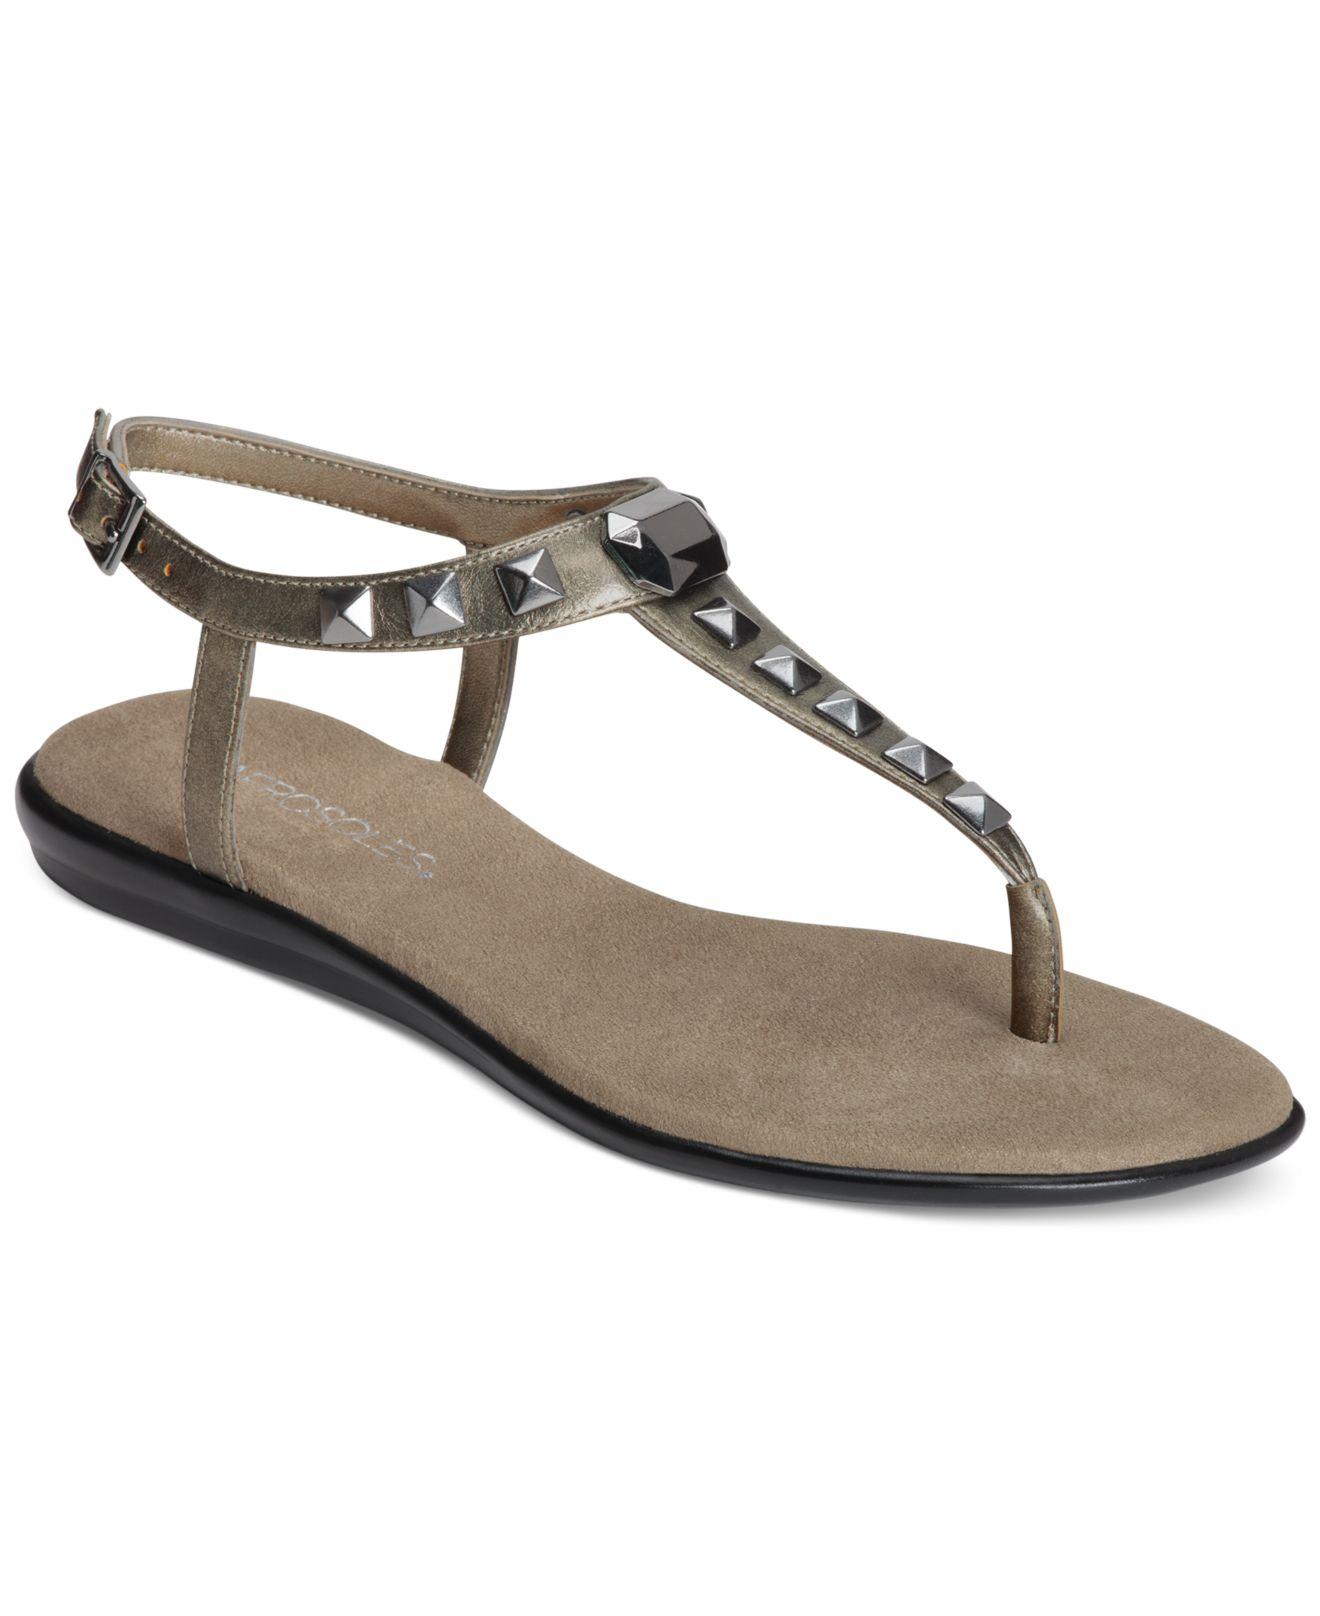 52af7bdd9543 Lyst - Aerosoles Chlose Together Flat Thong Sandals in Metallic